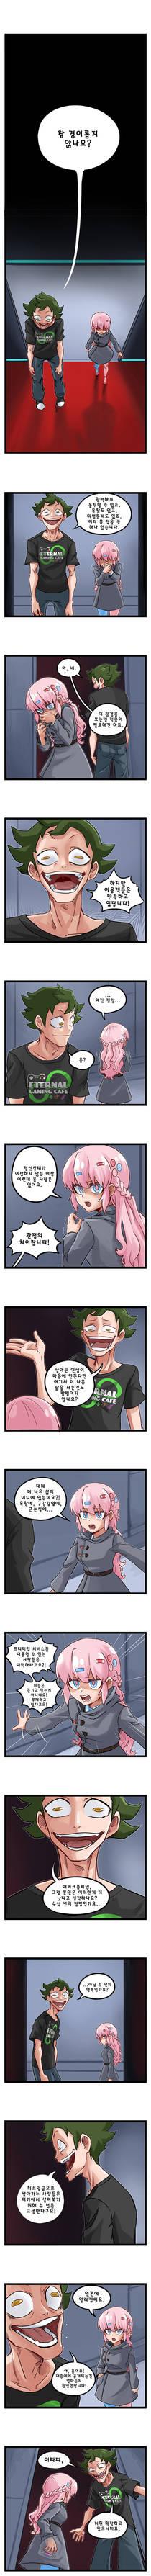 Clinic of Horrors - 51 (Korean Translated)